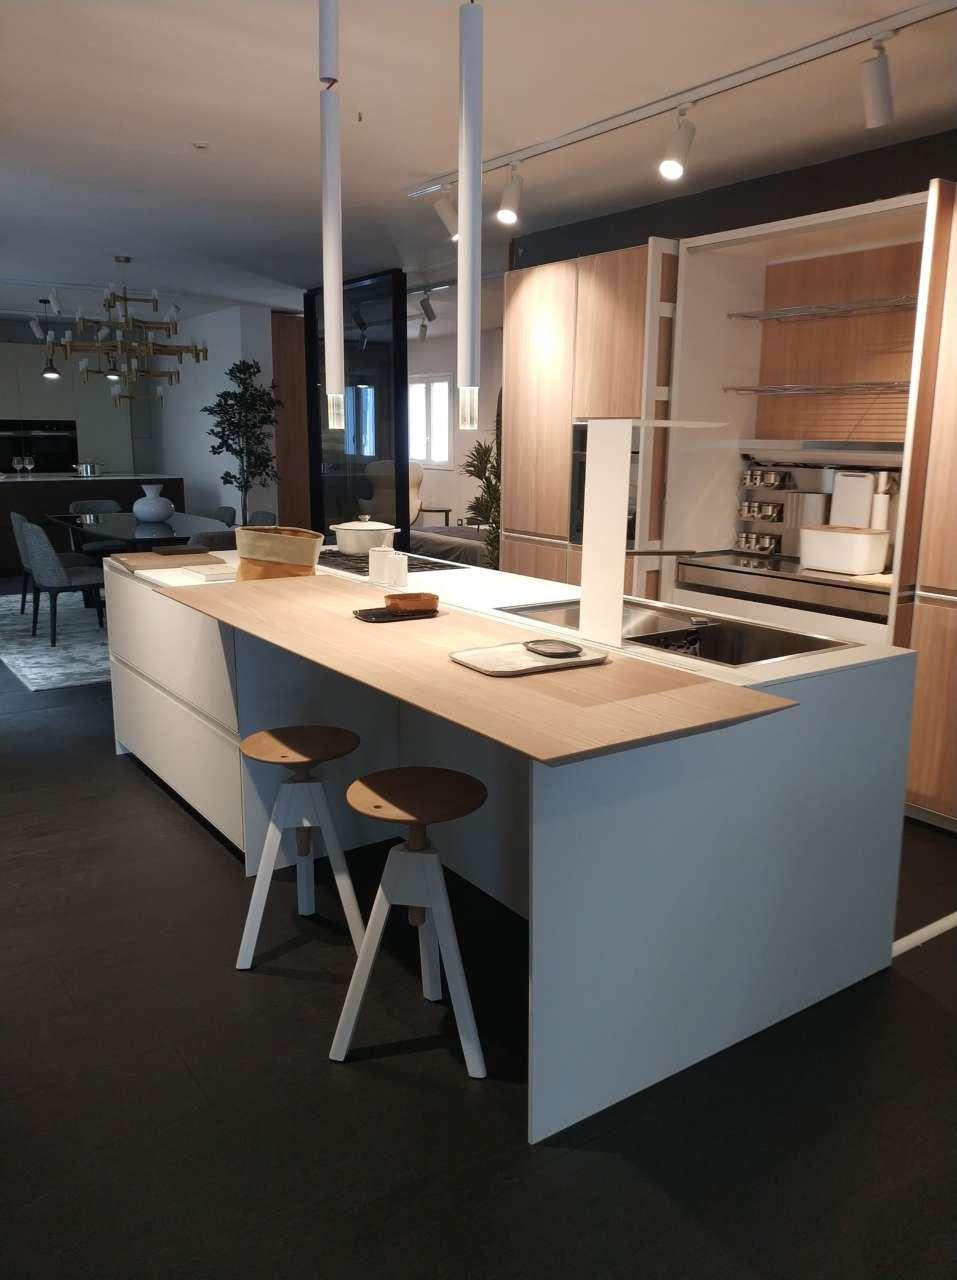 Mule_DesignforLiving_Alcamo_TP_cucina_bianca_legnochiaro